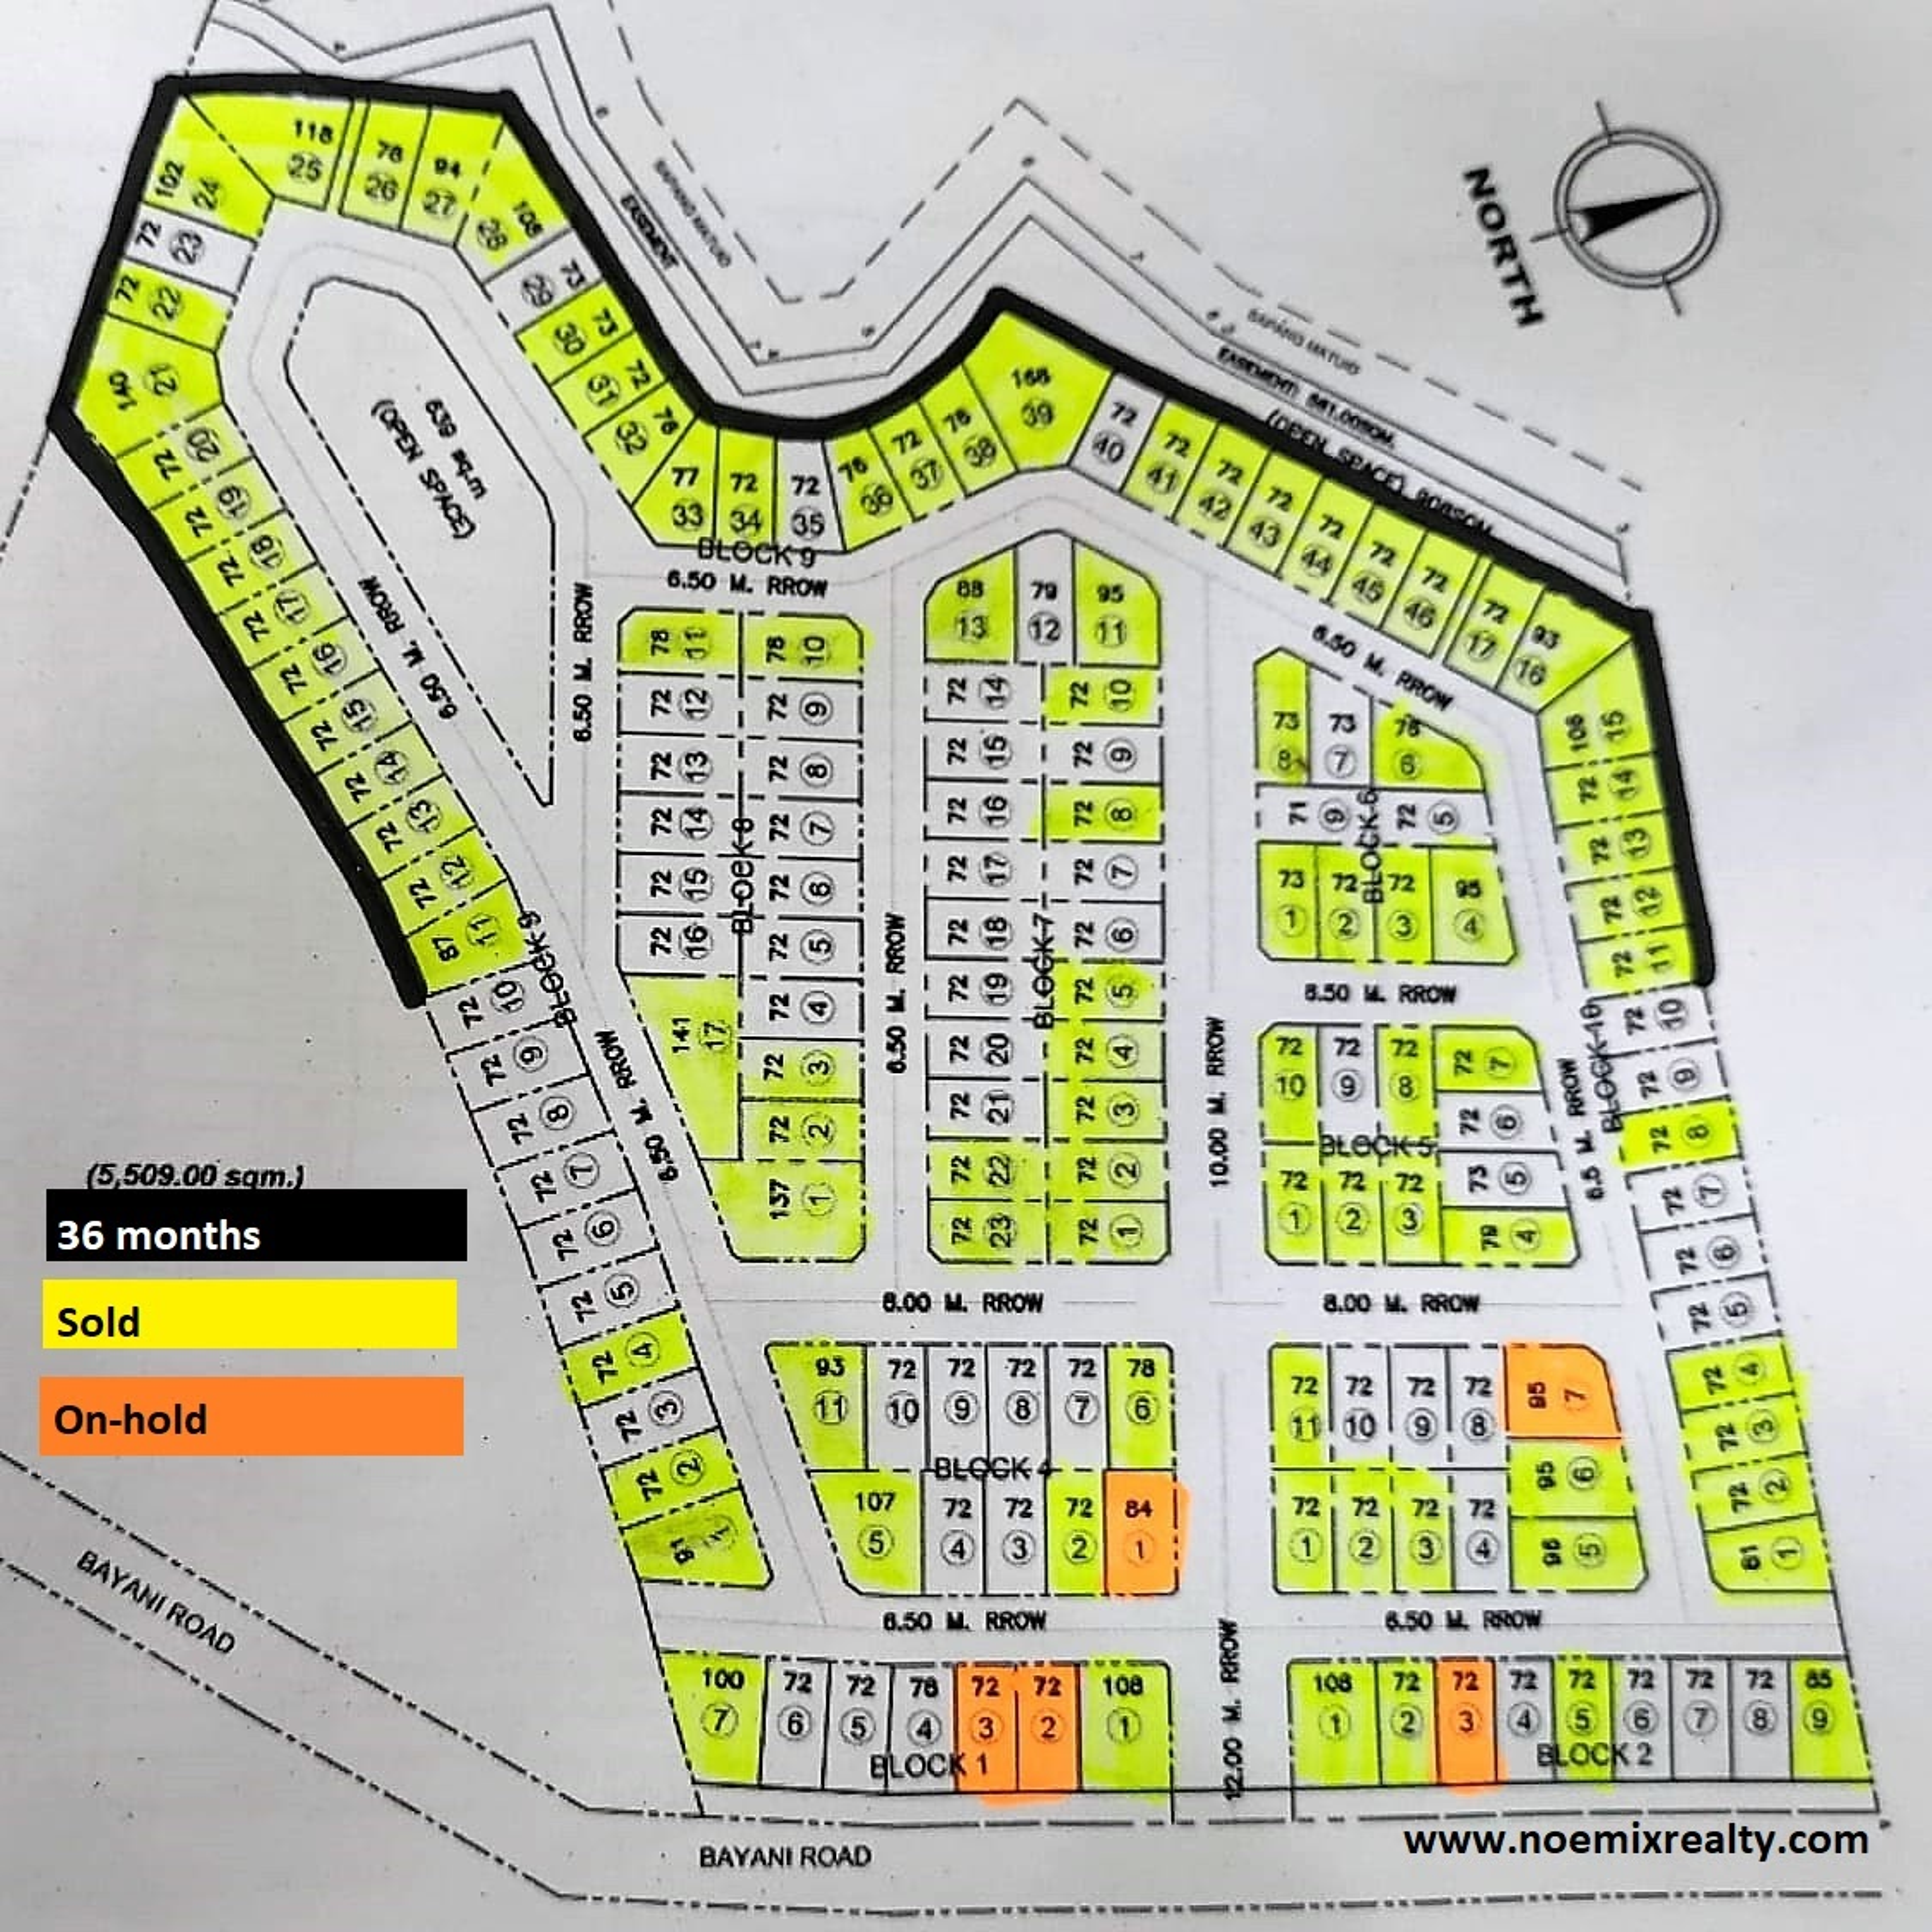 Eminenza 3 San Jose del Monte, Bulacan availability as of April 2021